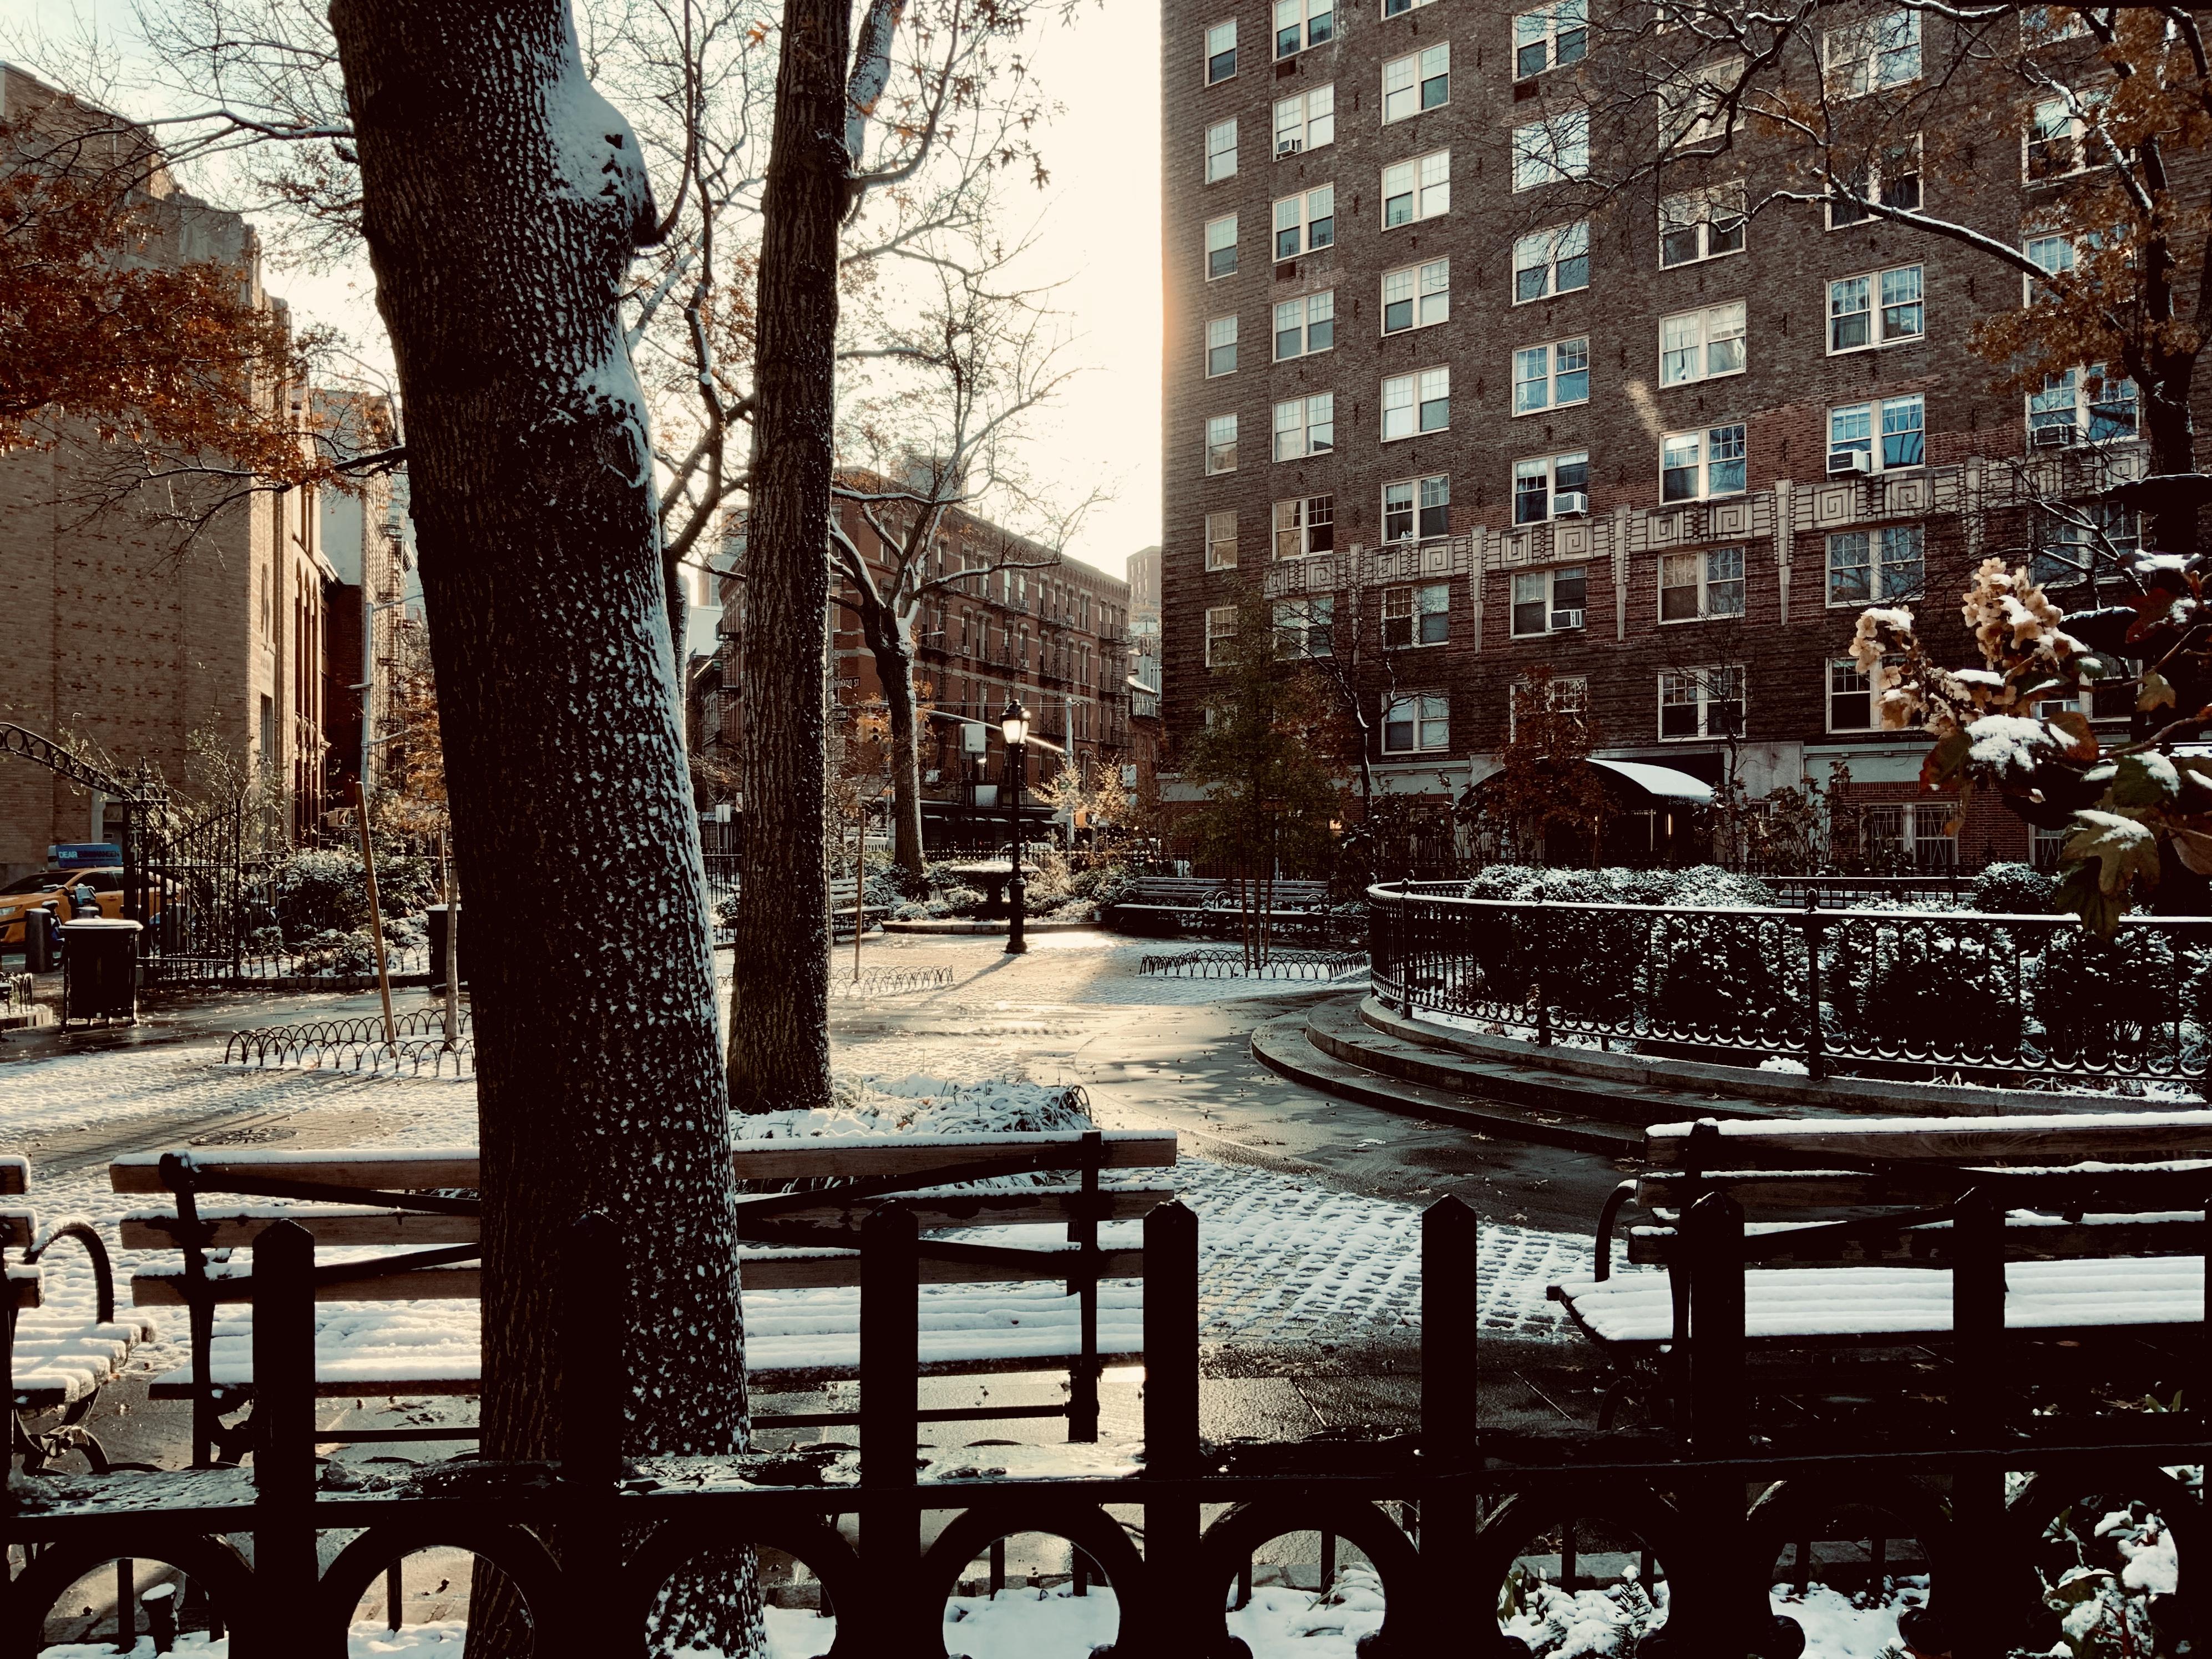 Jackson Square in New York City